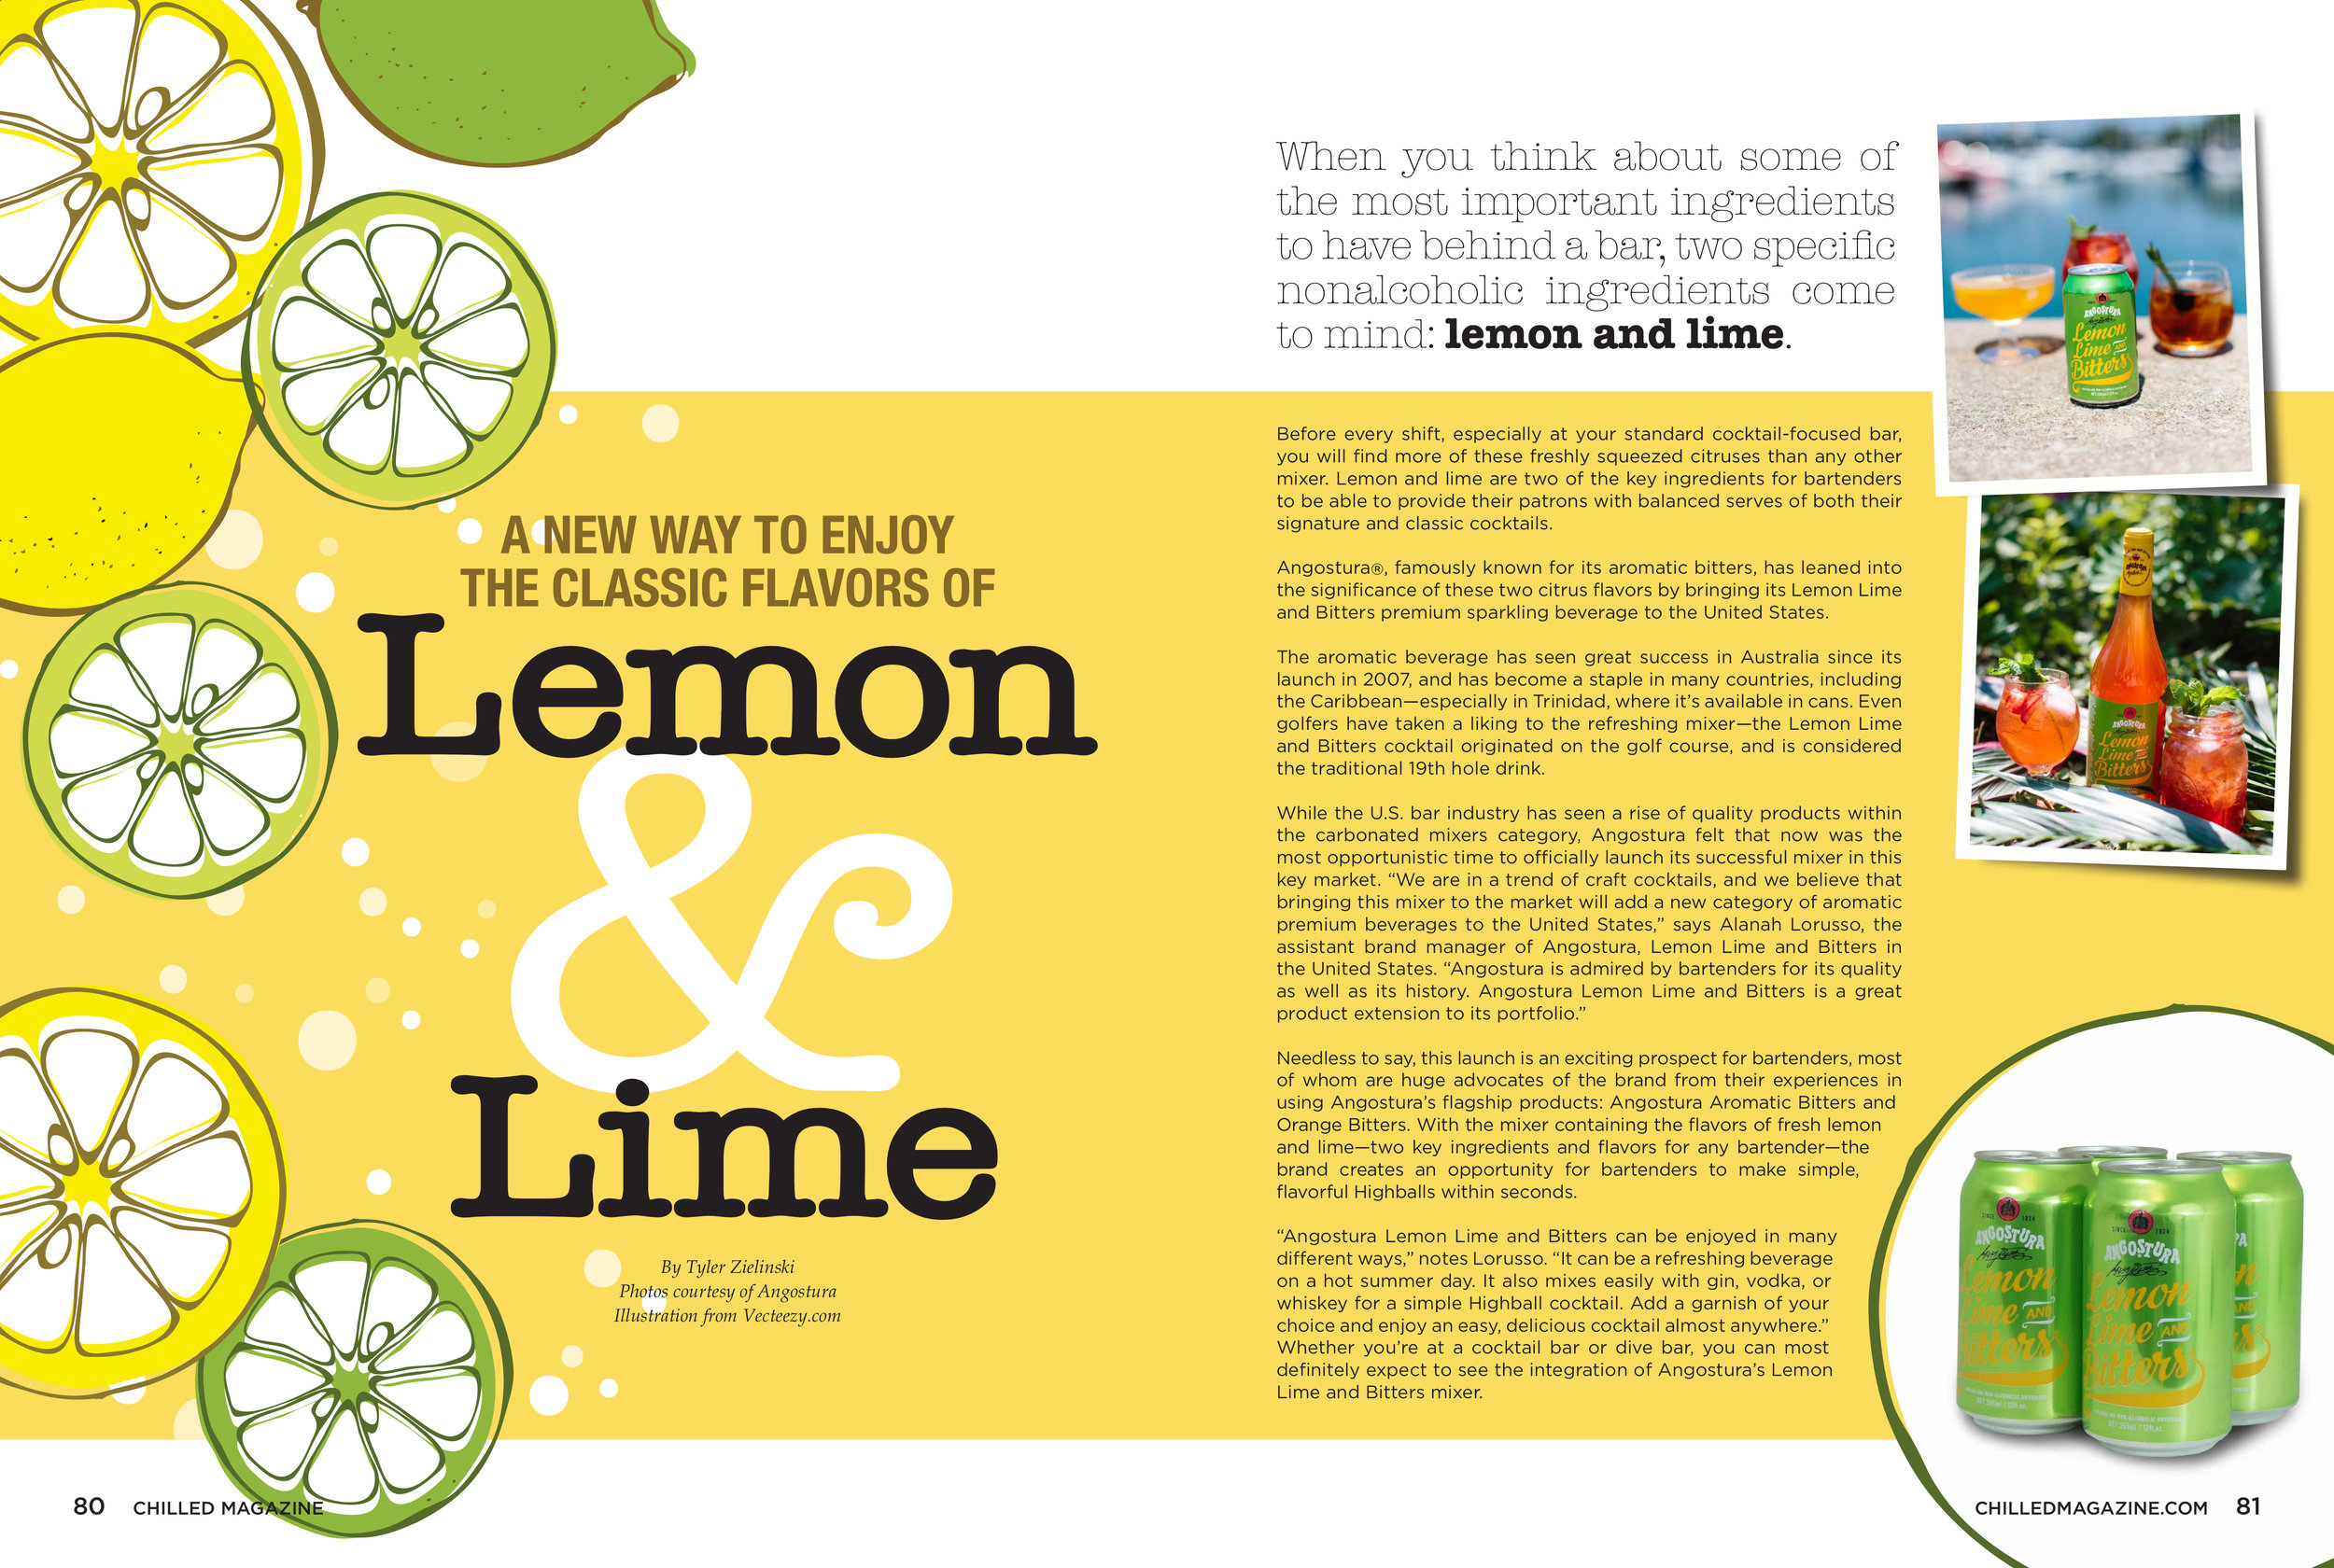 Chilled Magazine - Angostura Feature -Lemon & Lime.jpg